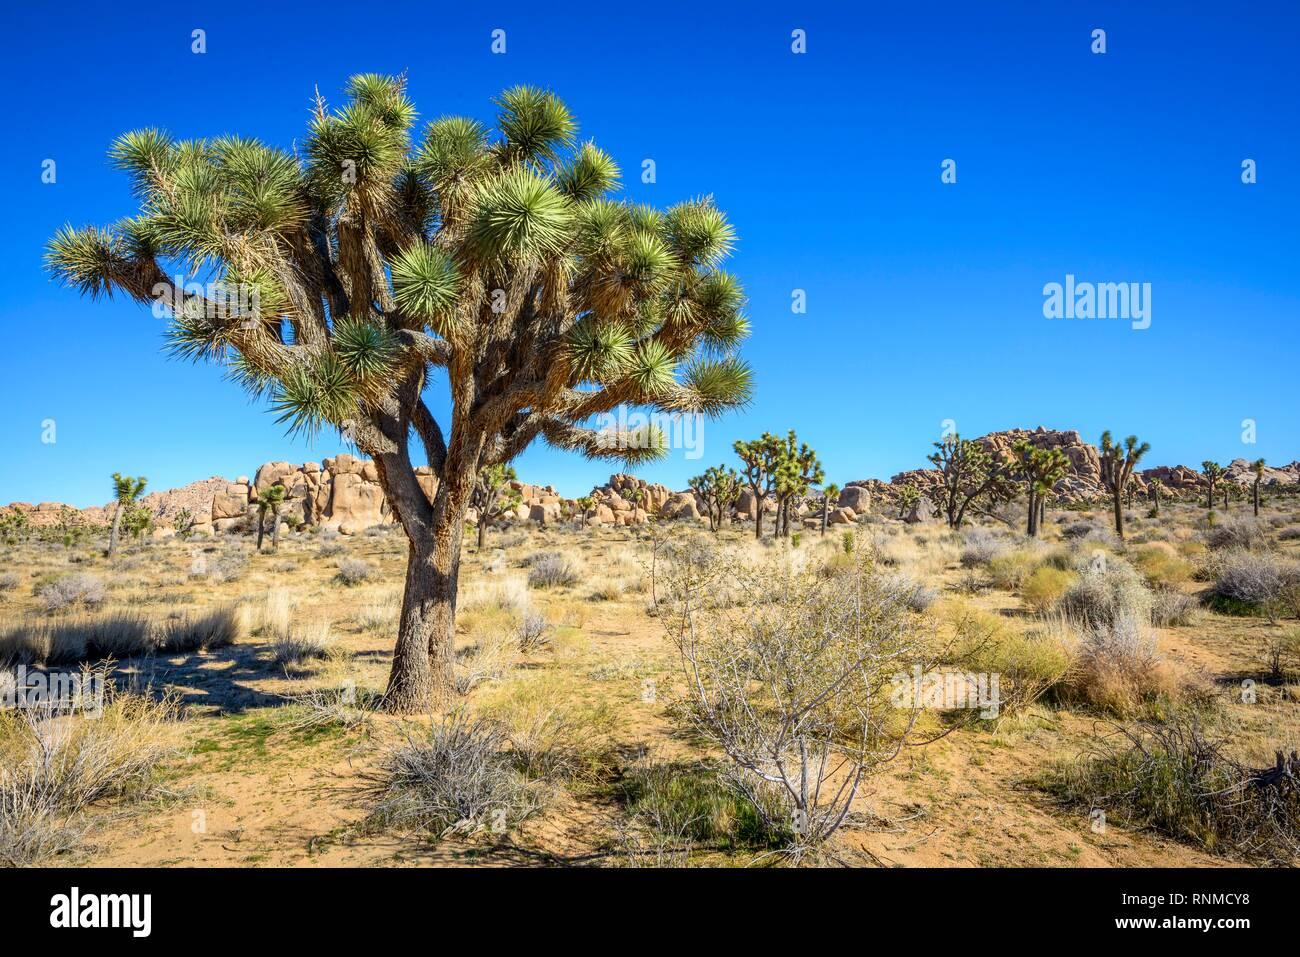 Joshua Tree (Yucca brevifolia), Boy Scout Trail, Joshua Tree National Park, Desert Center, California, USA - Stock Image